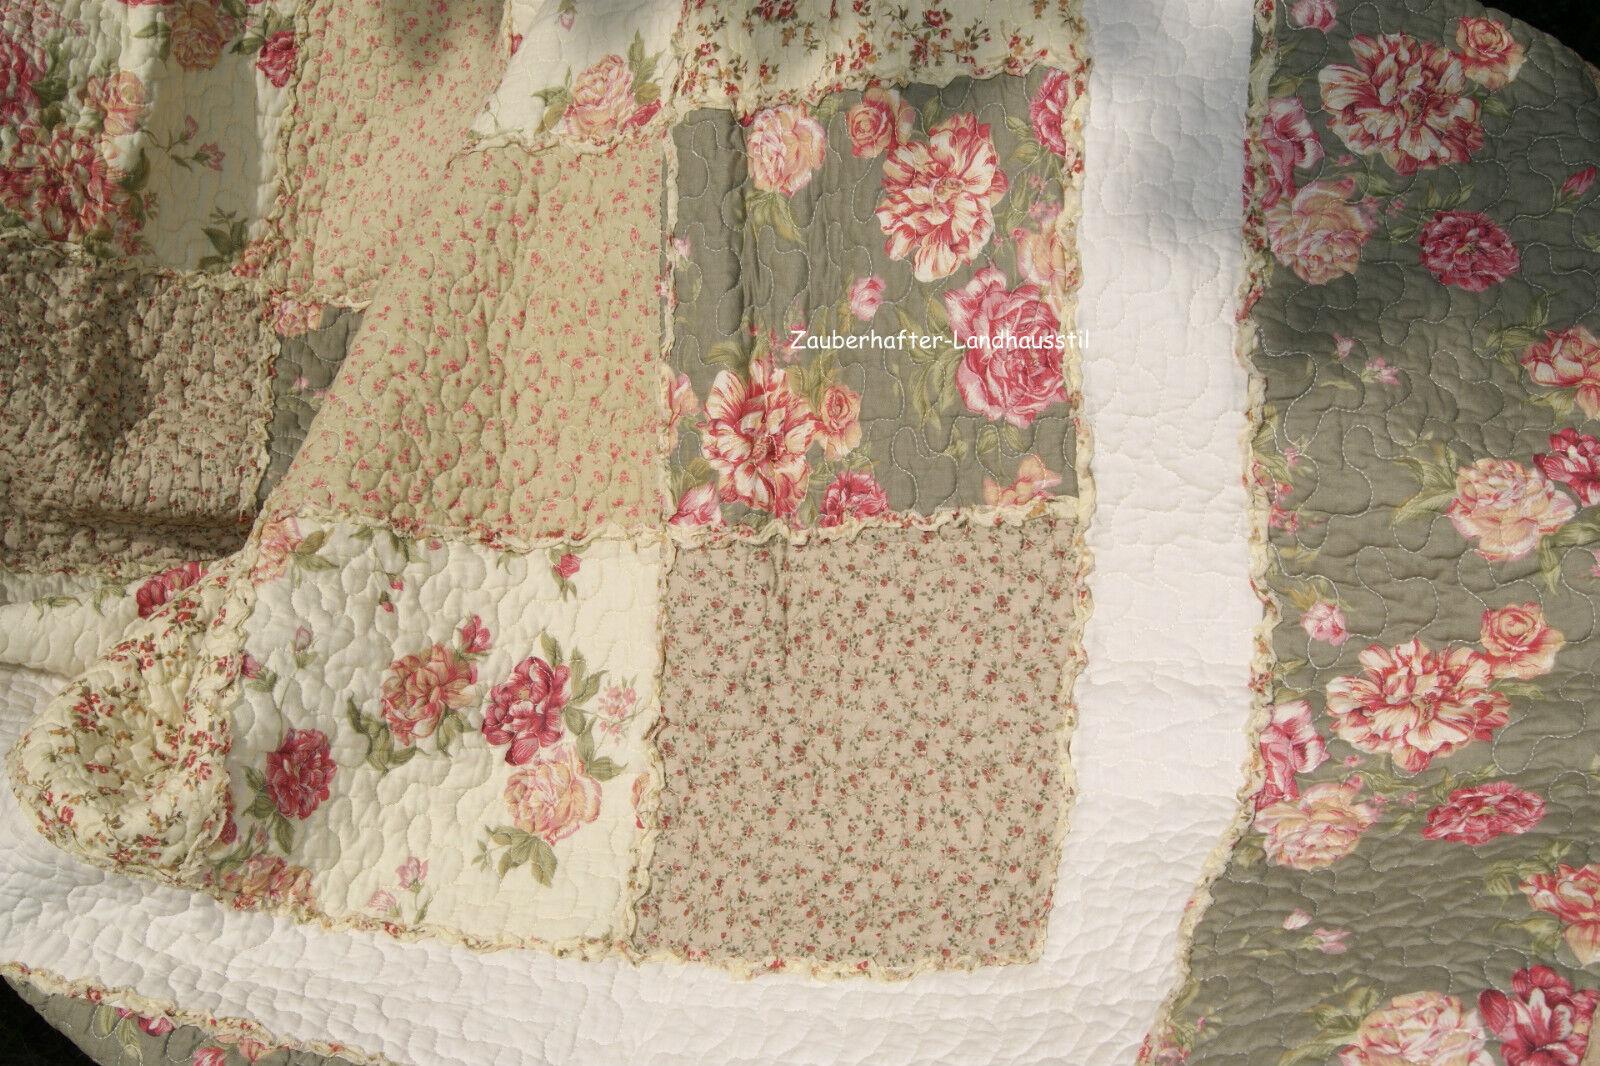 bea tagesdecke braun grau beige rosen plaid shabby. Black Bedroom Furniture Sets. Home Design Ideas